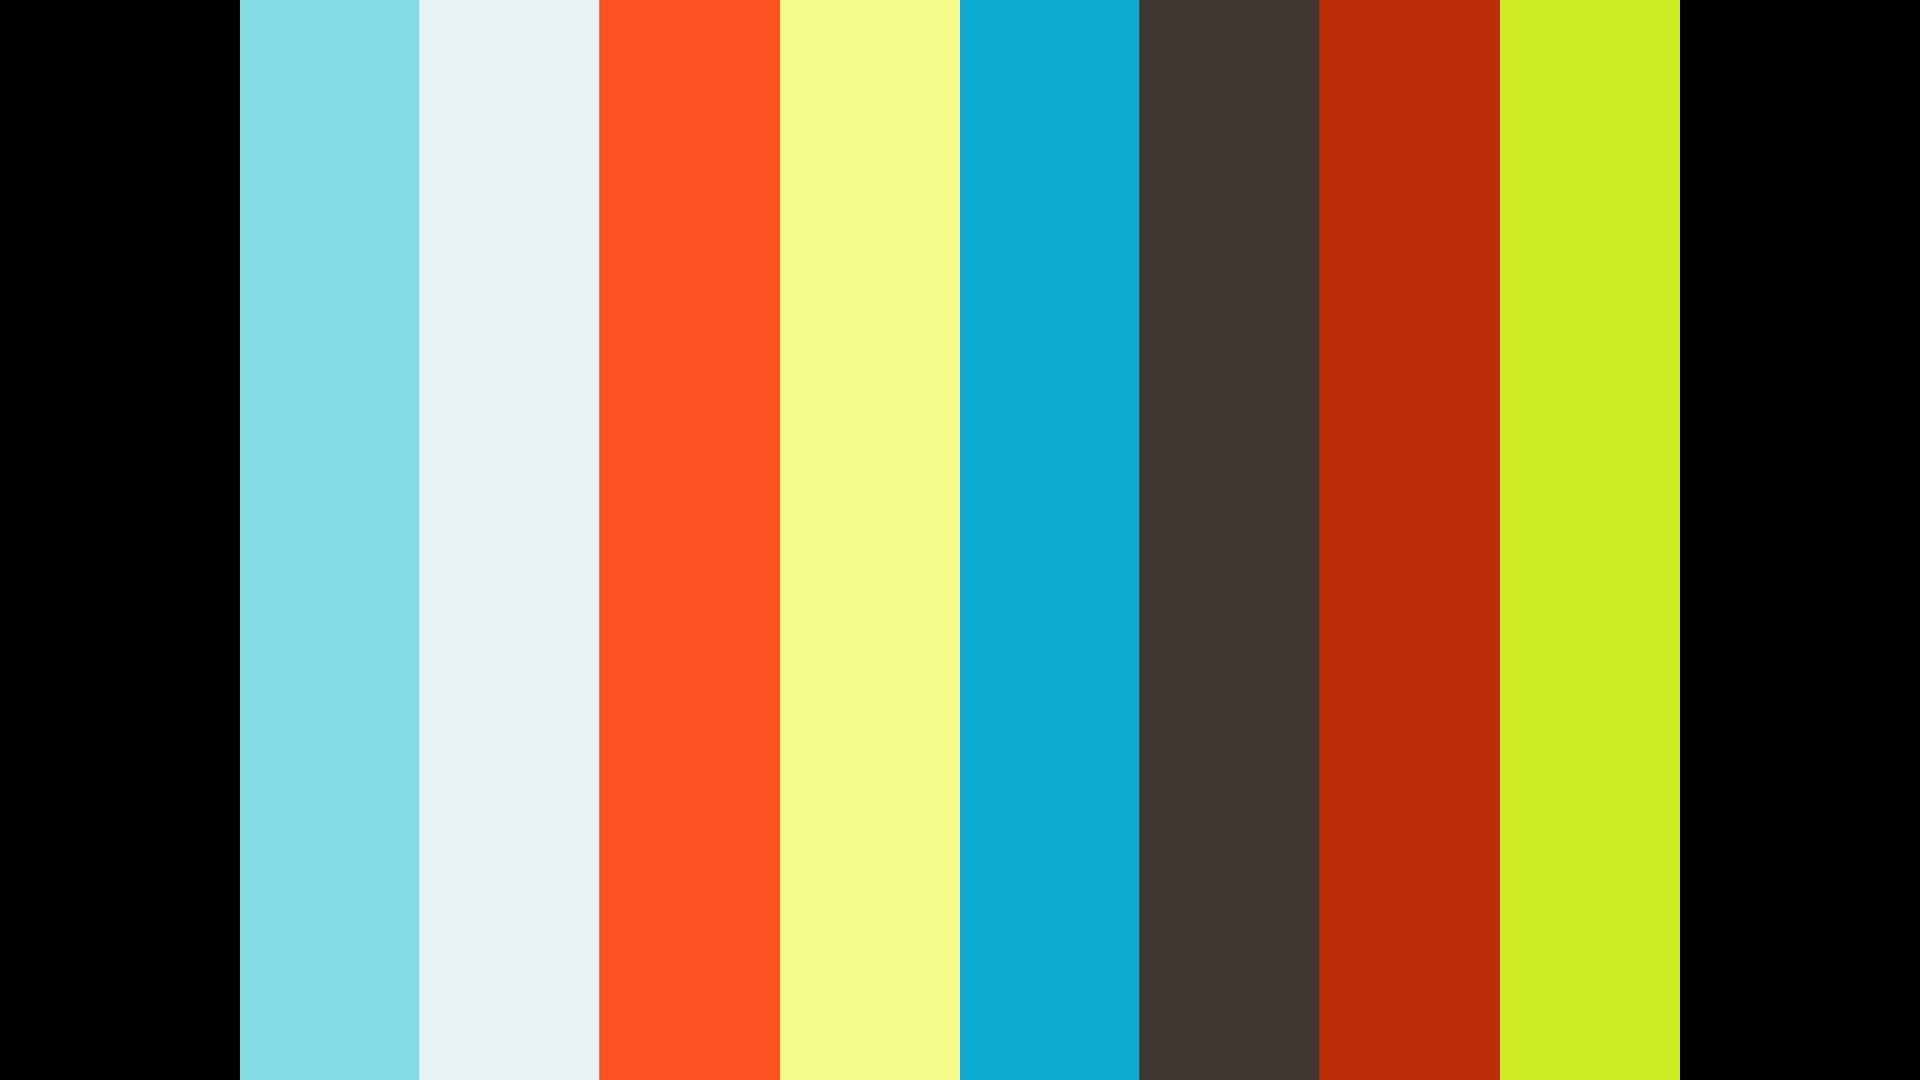 LIVE 30 MARS - ZUMBA - MYRIAM & STEPHANE